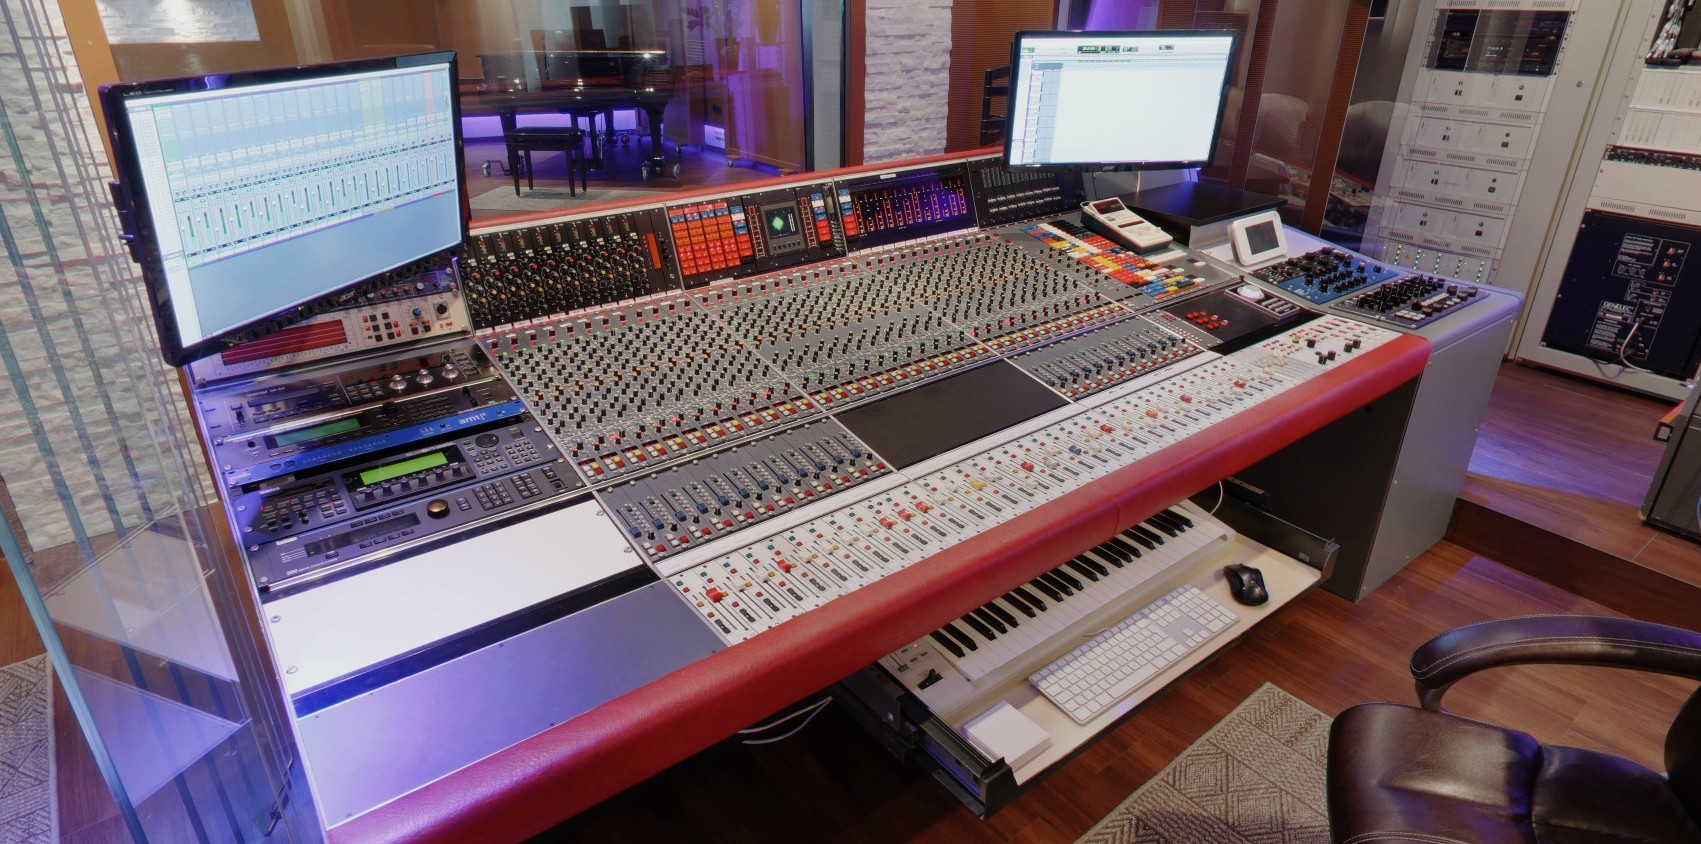 Tonstudio Tirol - Musikproduktion Österreich - Aktiv Sound Records - Neve V66 - Manley Mastering - Neumann Mikrofon Tirol - Brauner - AKG Österreich